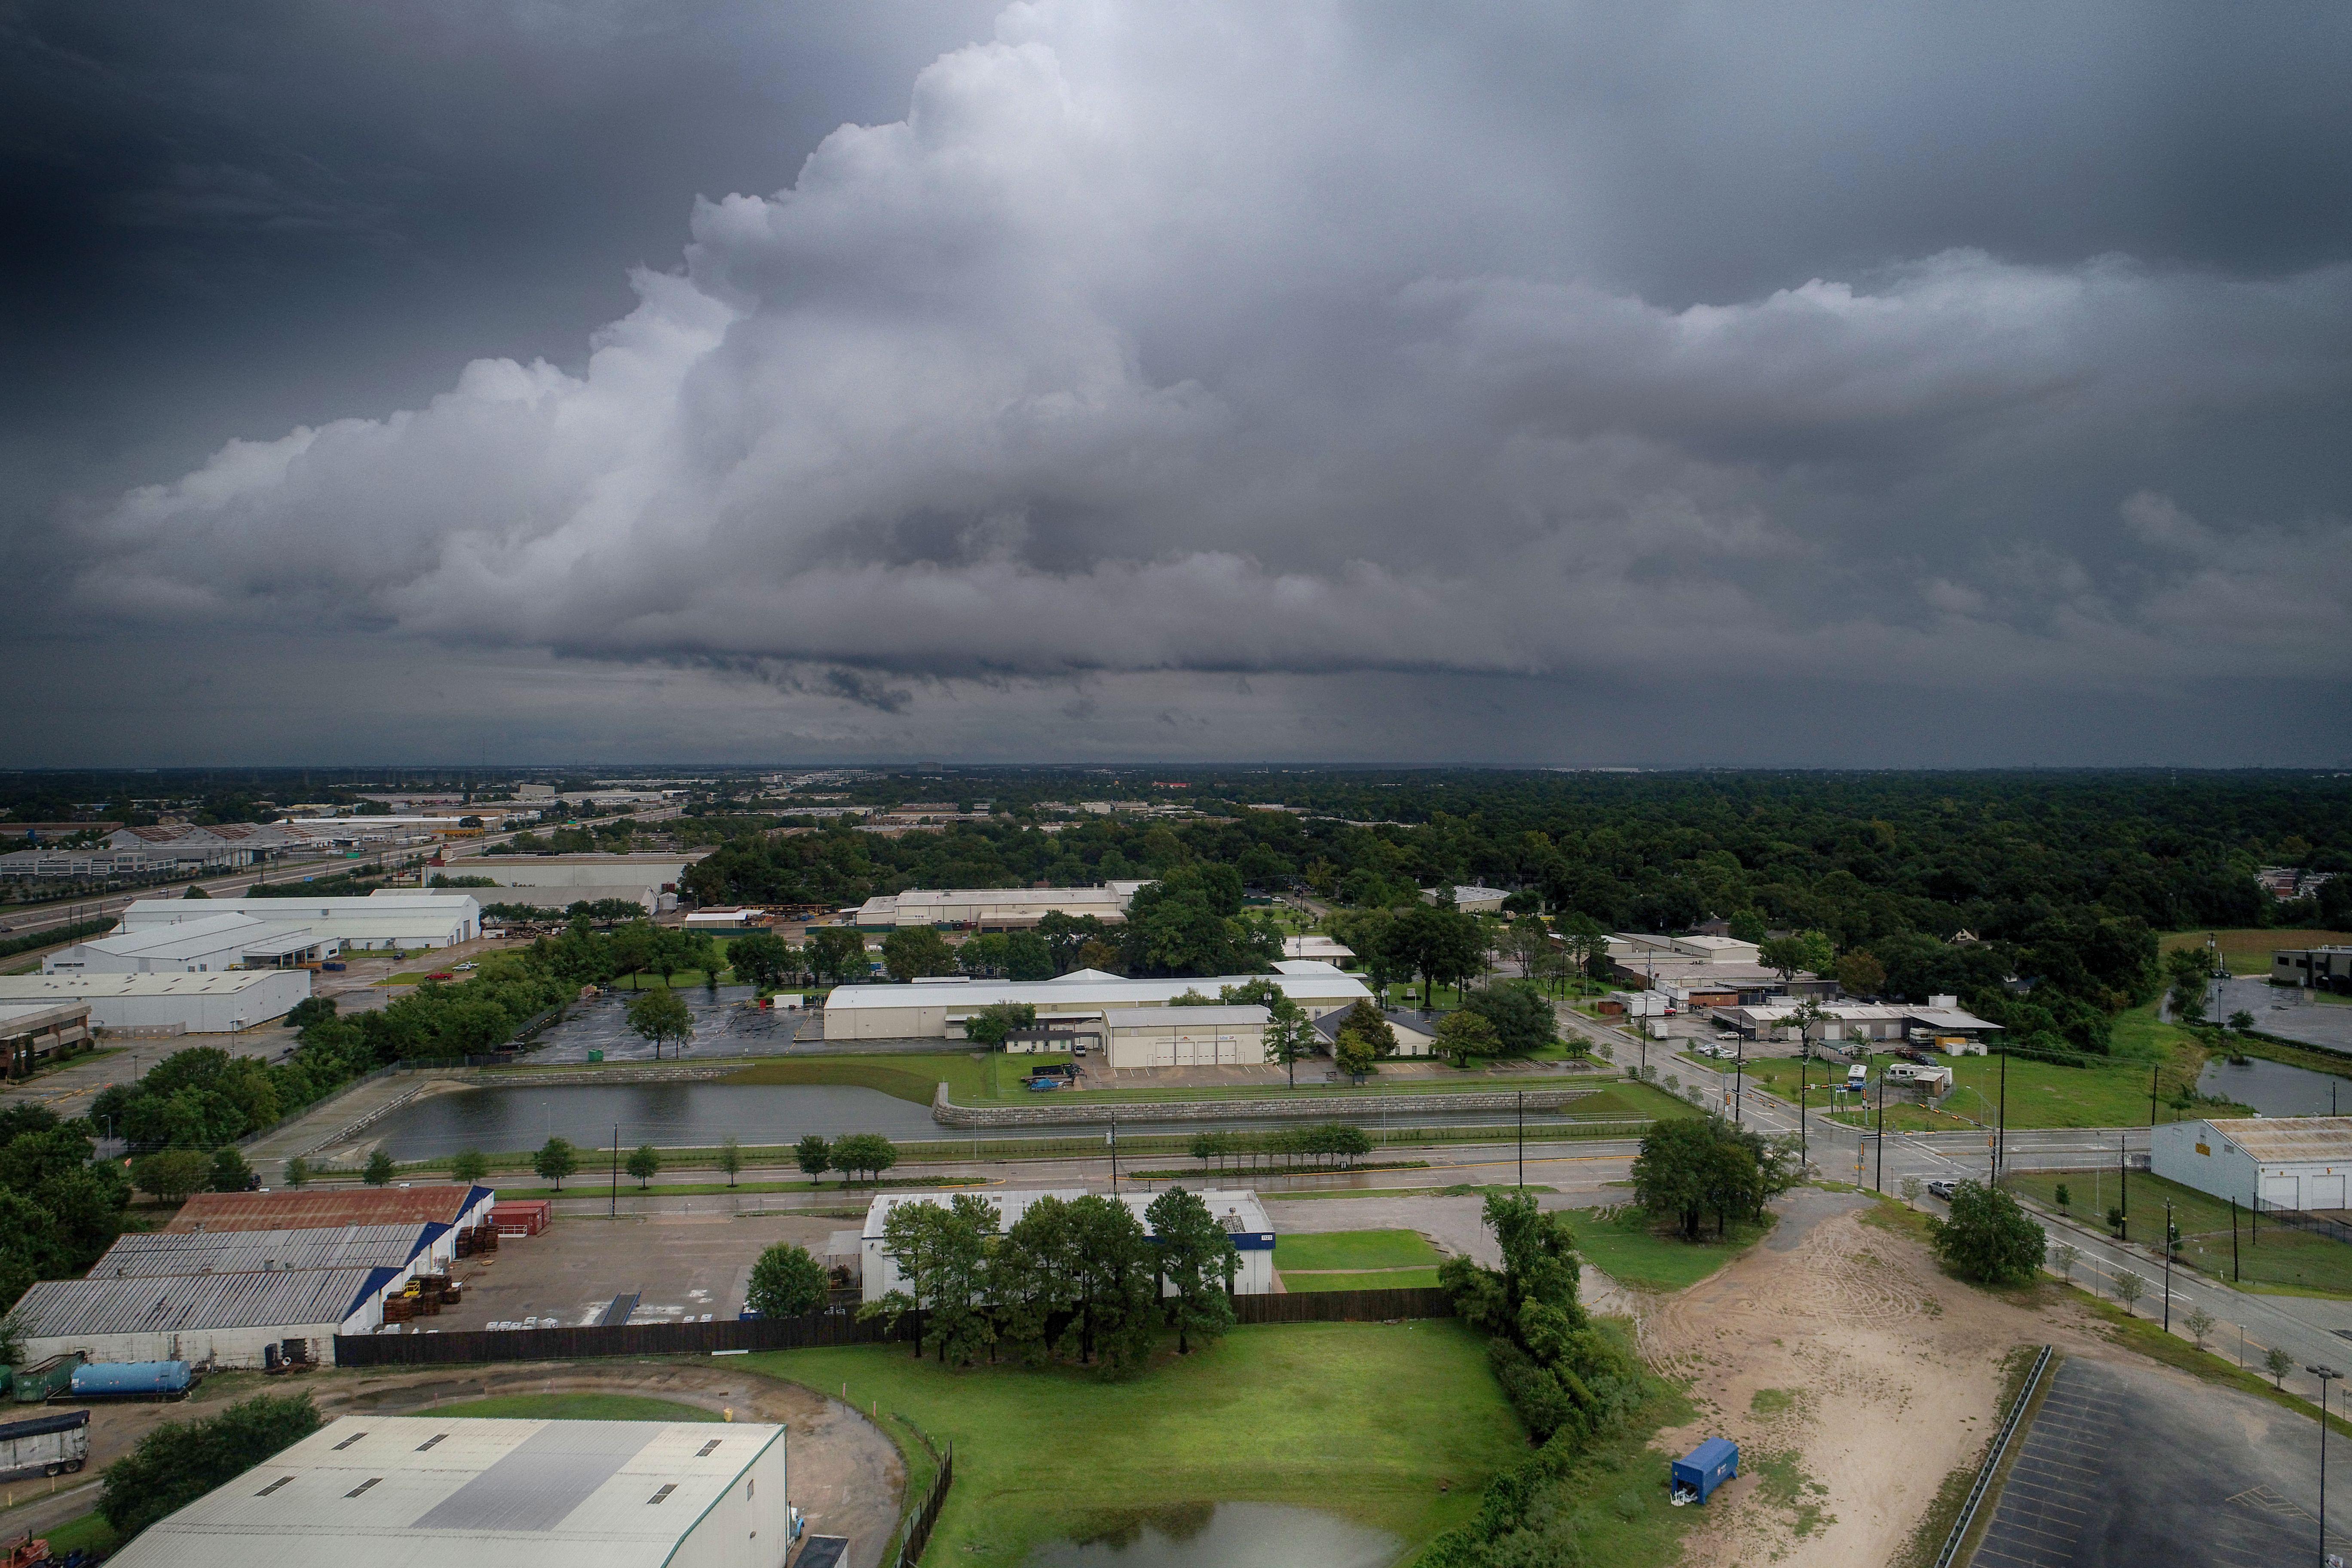 HurricaneHarvey_Day2_05